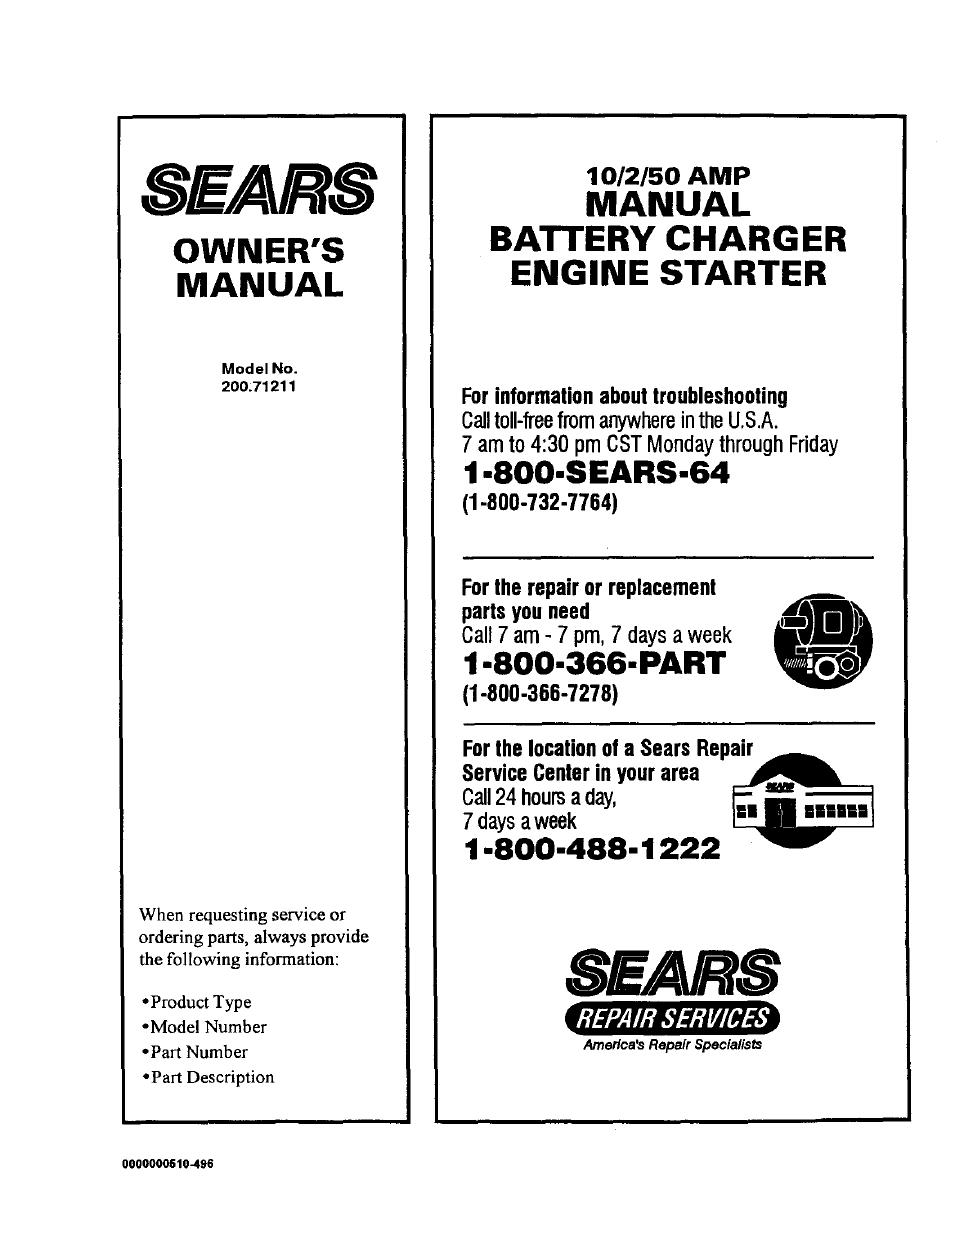 Groß Sears Traktor Schaltplan 16 6 917 25170 Ideen - Elektrische ...